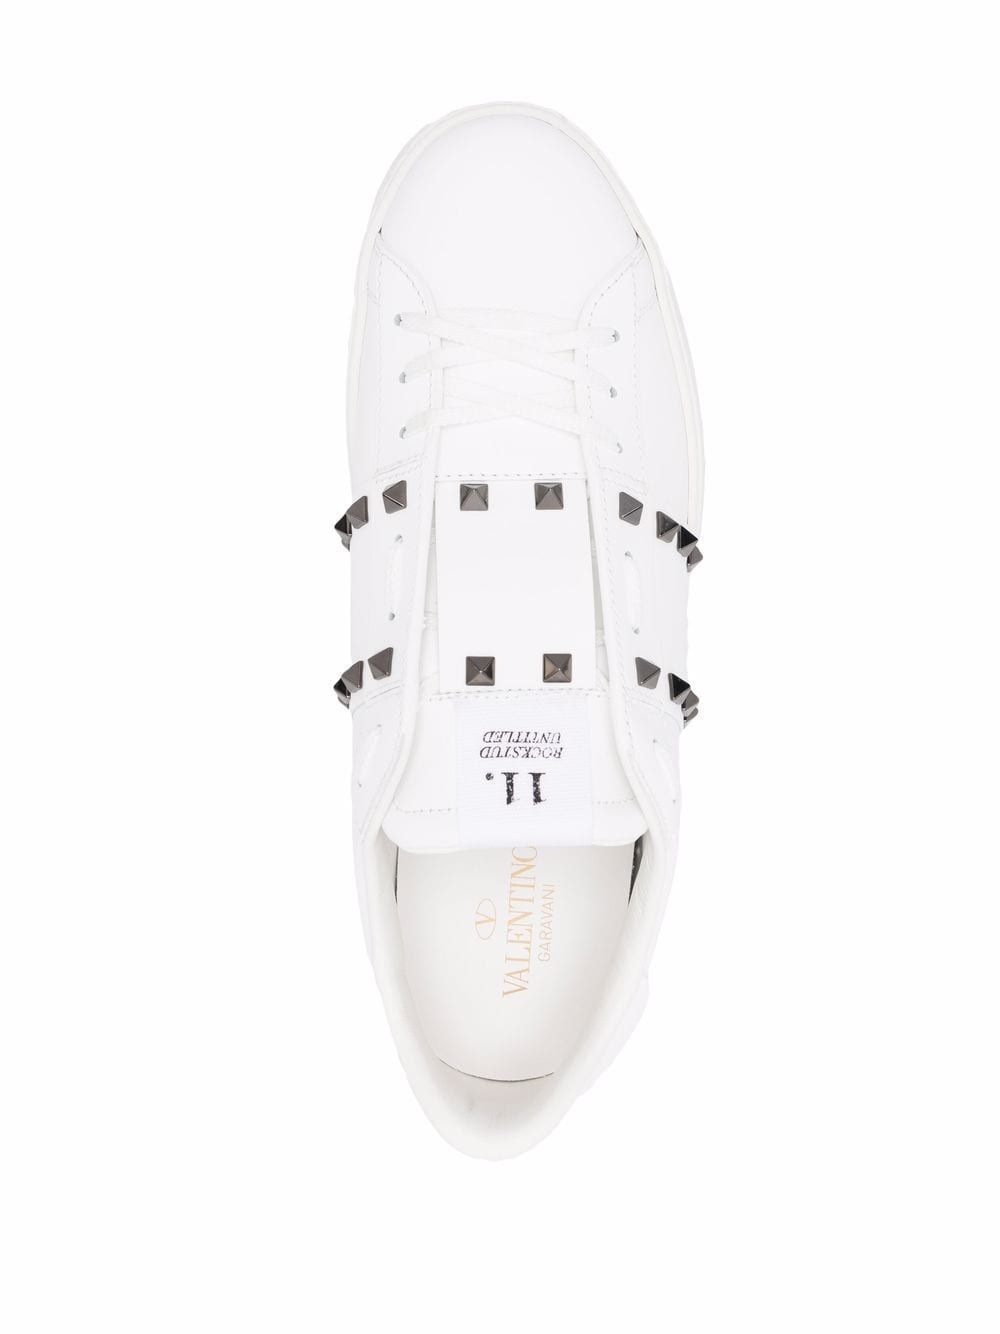 Sneaker rockstud untitled in pelleundefined